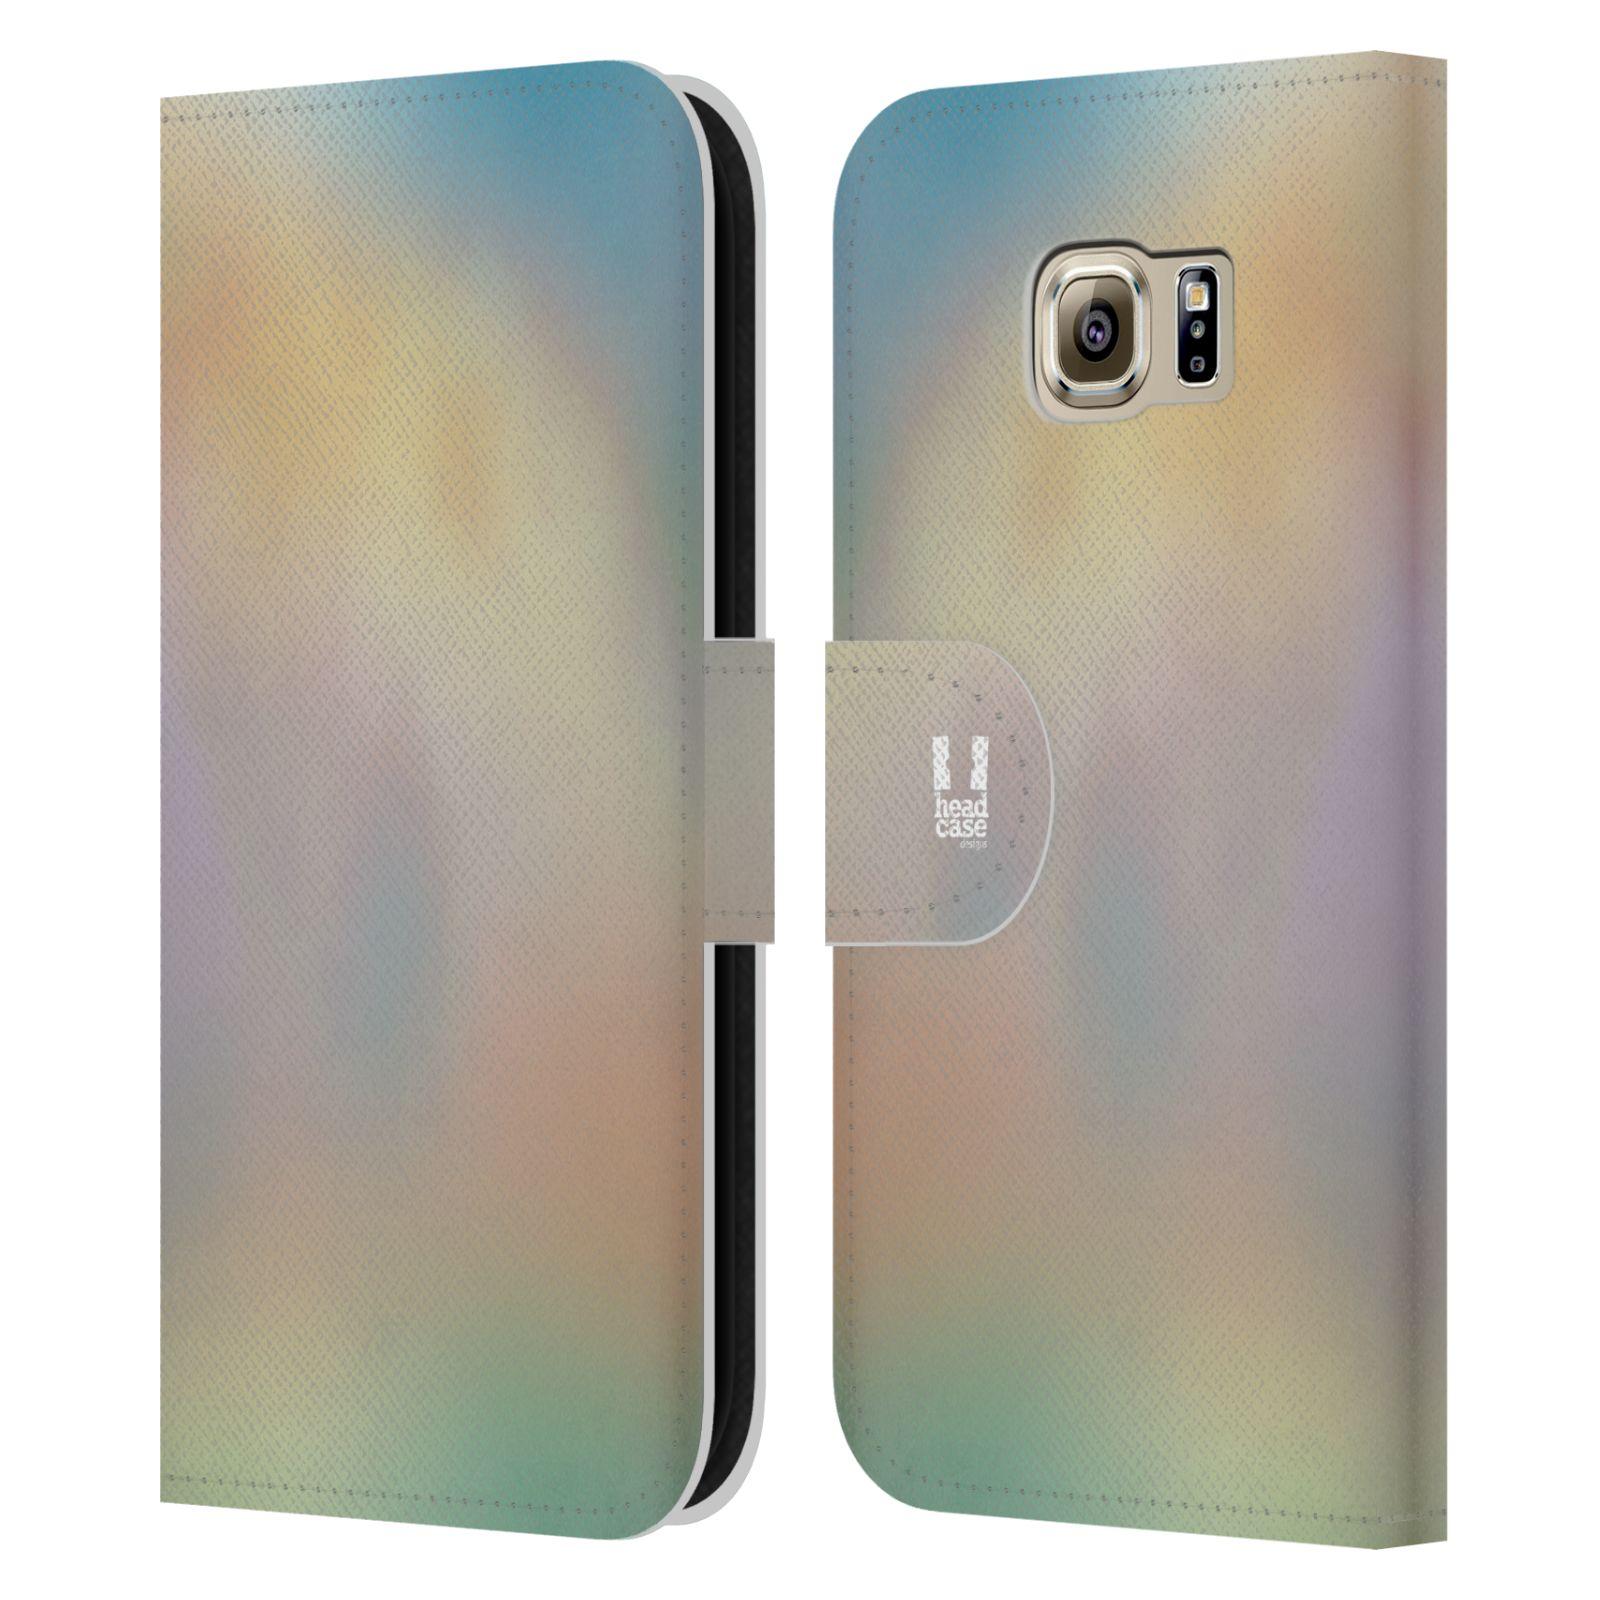 HEAD CASE Flipové pouzdro pro mobil Samsung Galaxy S6 (G9200) AQUAREL barvy CHILL